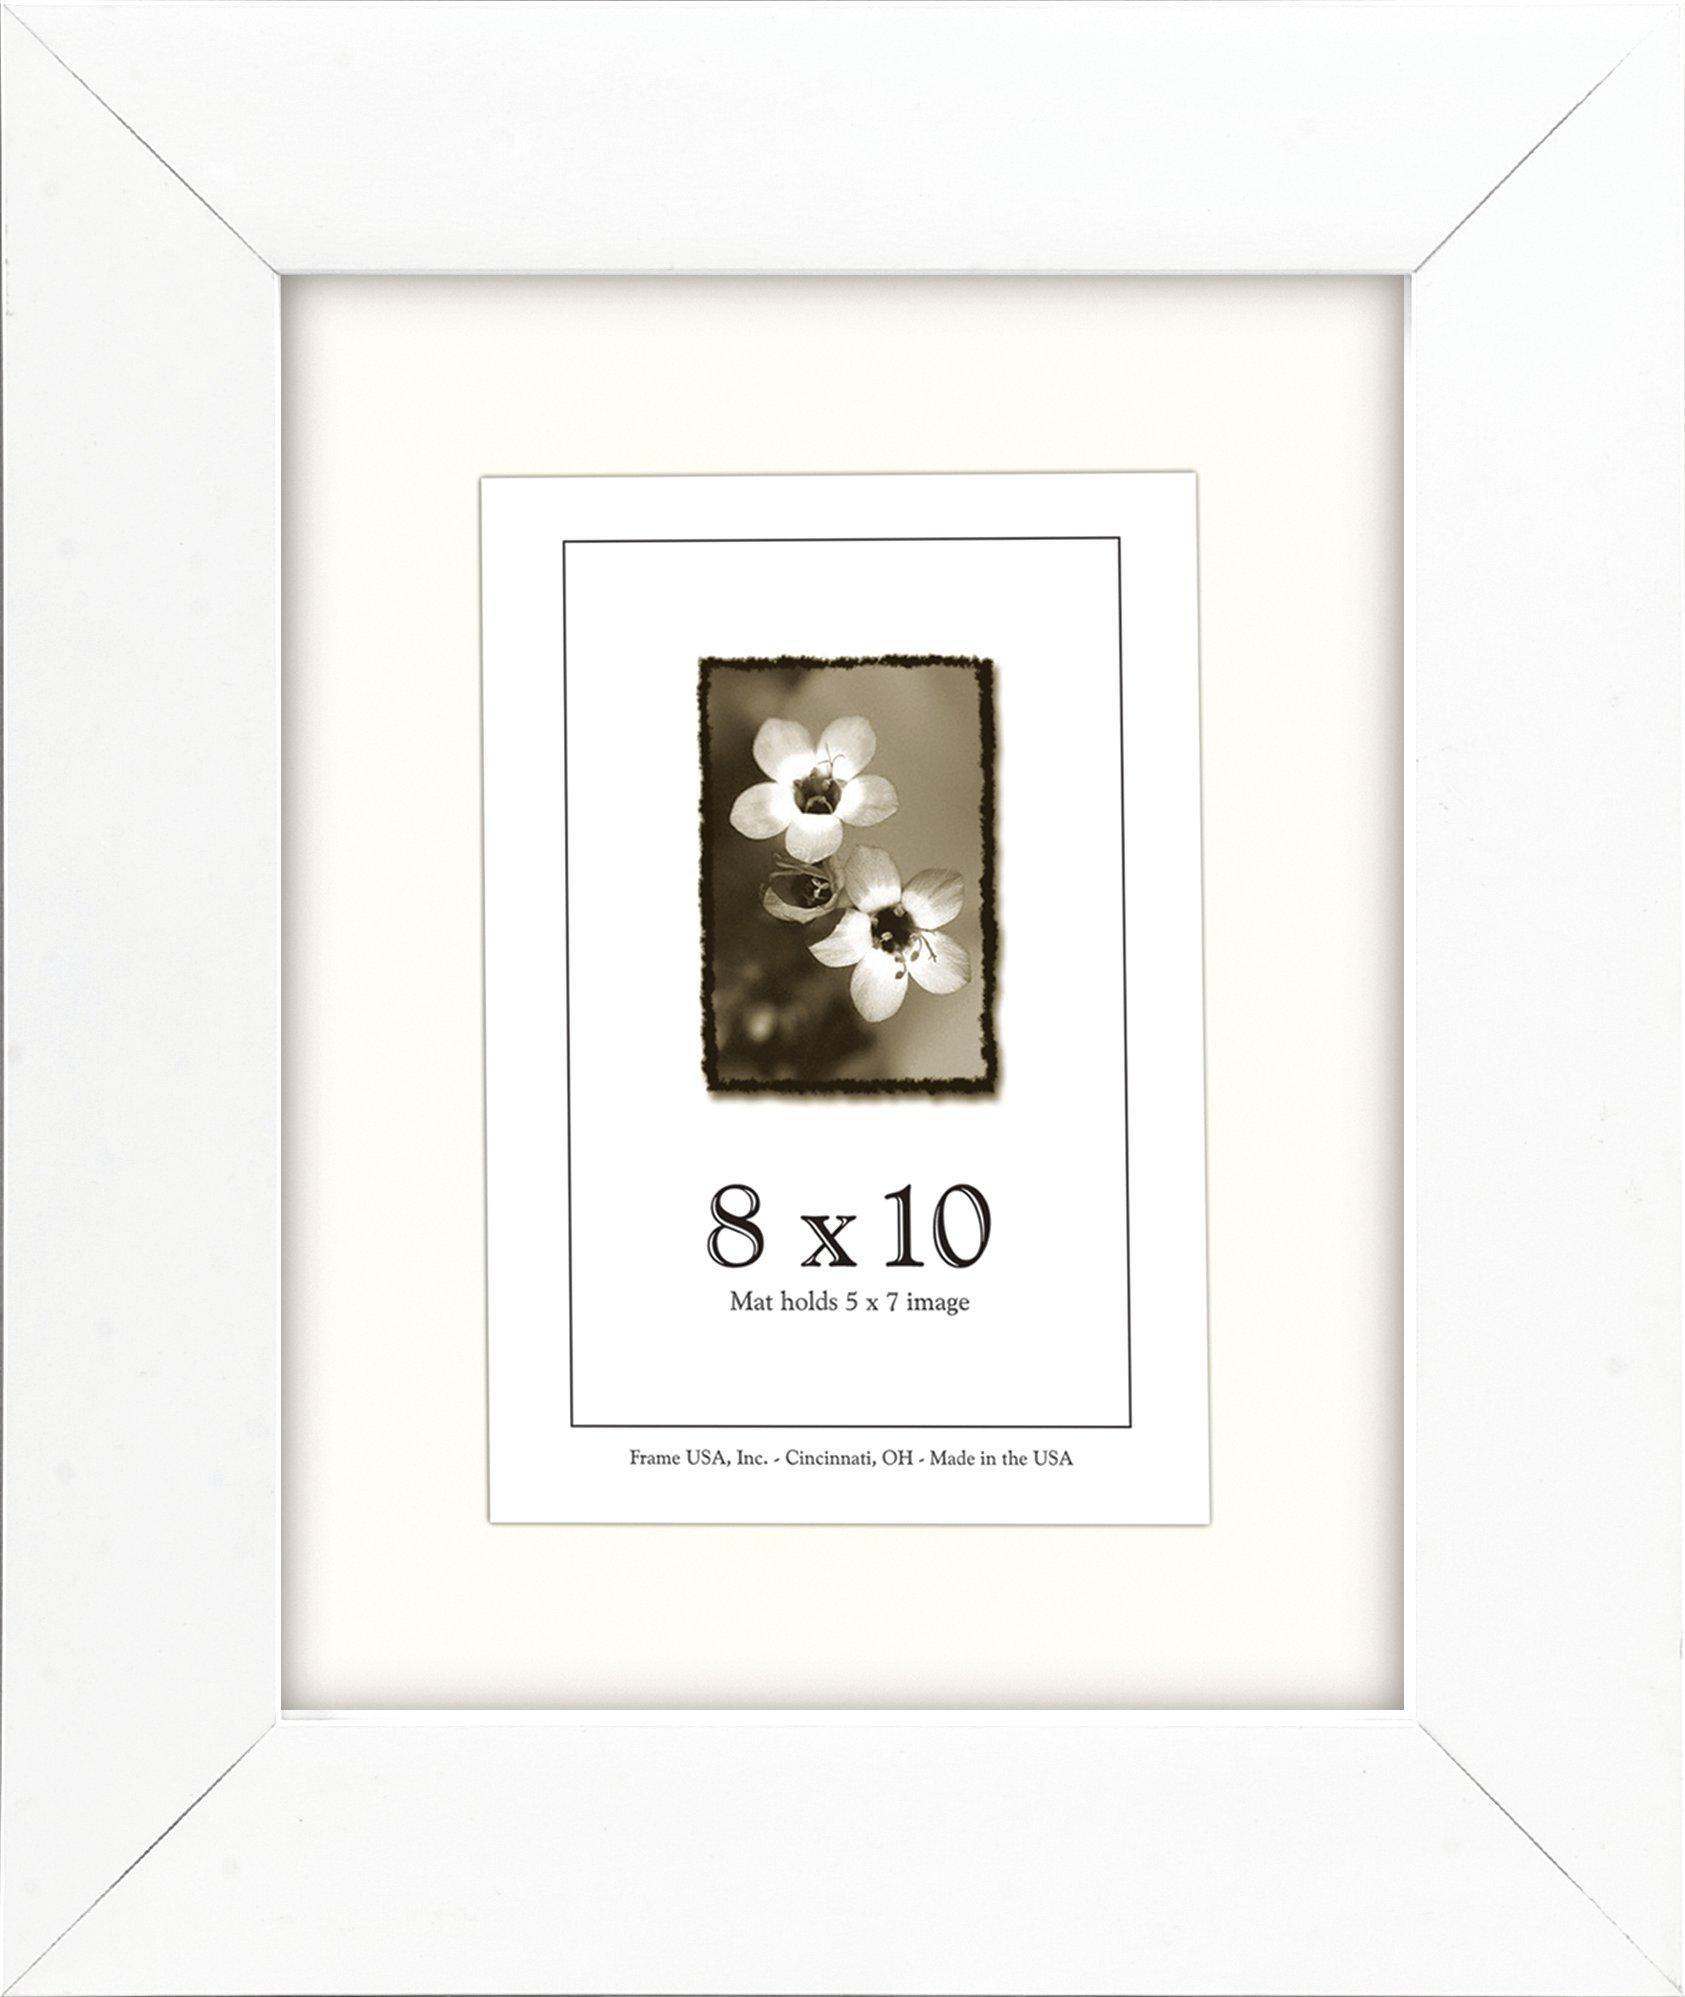 abstract series - white frame - Frame USA\'s Blog